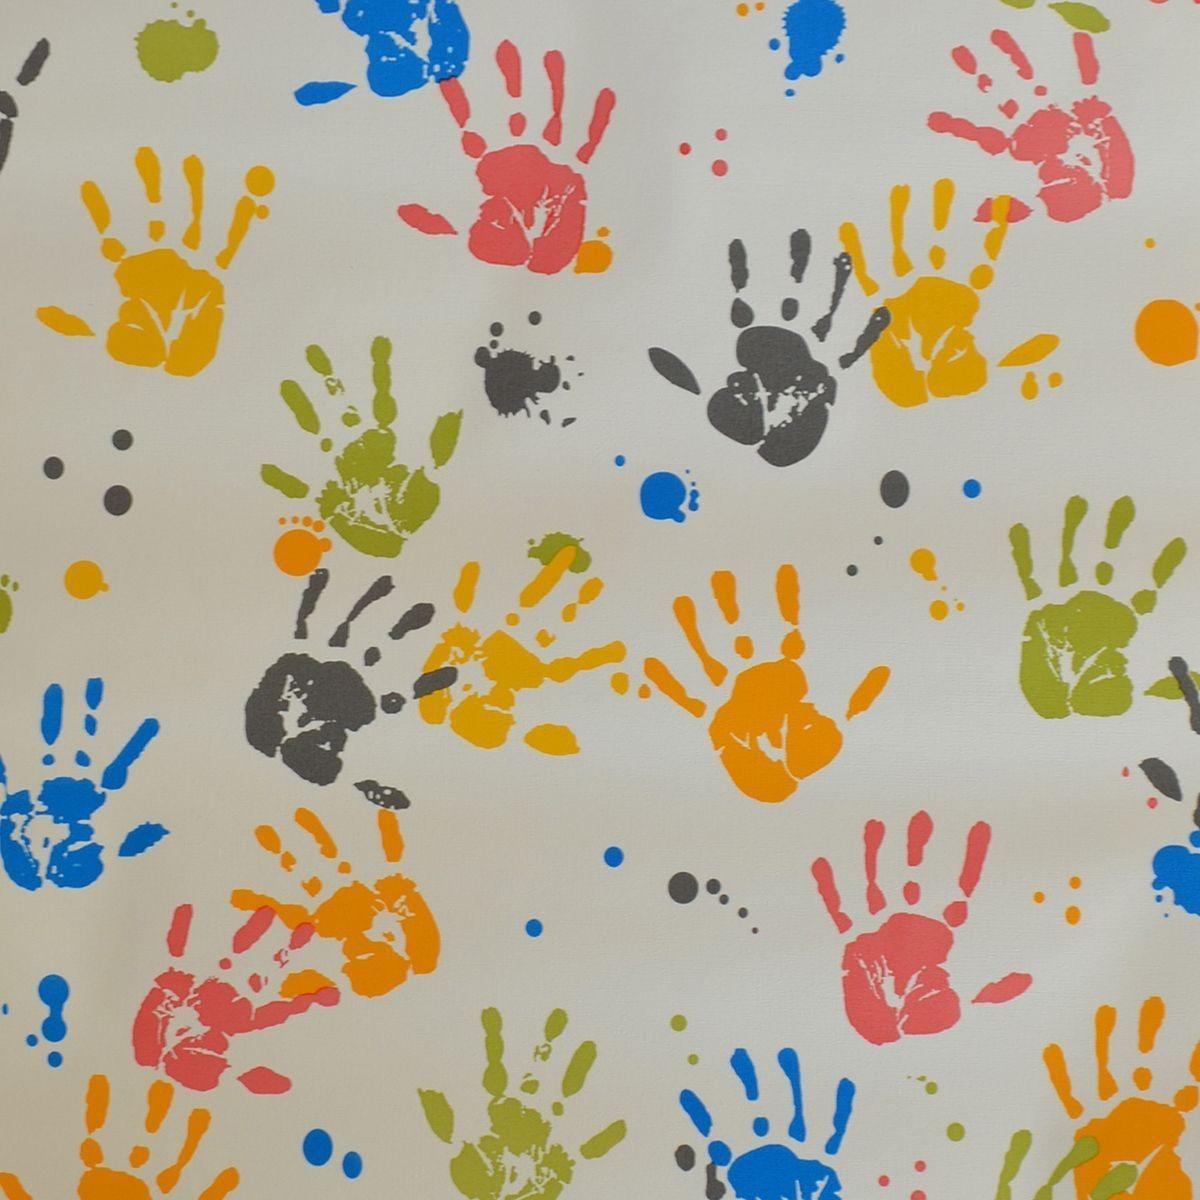 Papel De Parede De Pvc 0 53 X 10m Desenho Maos Coloridas R